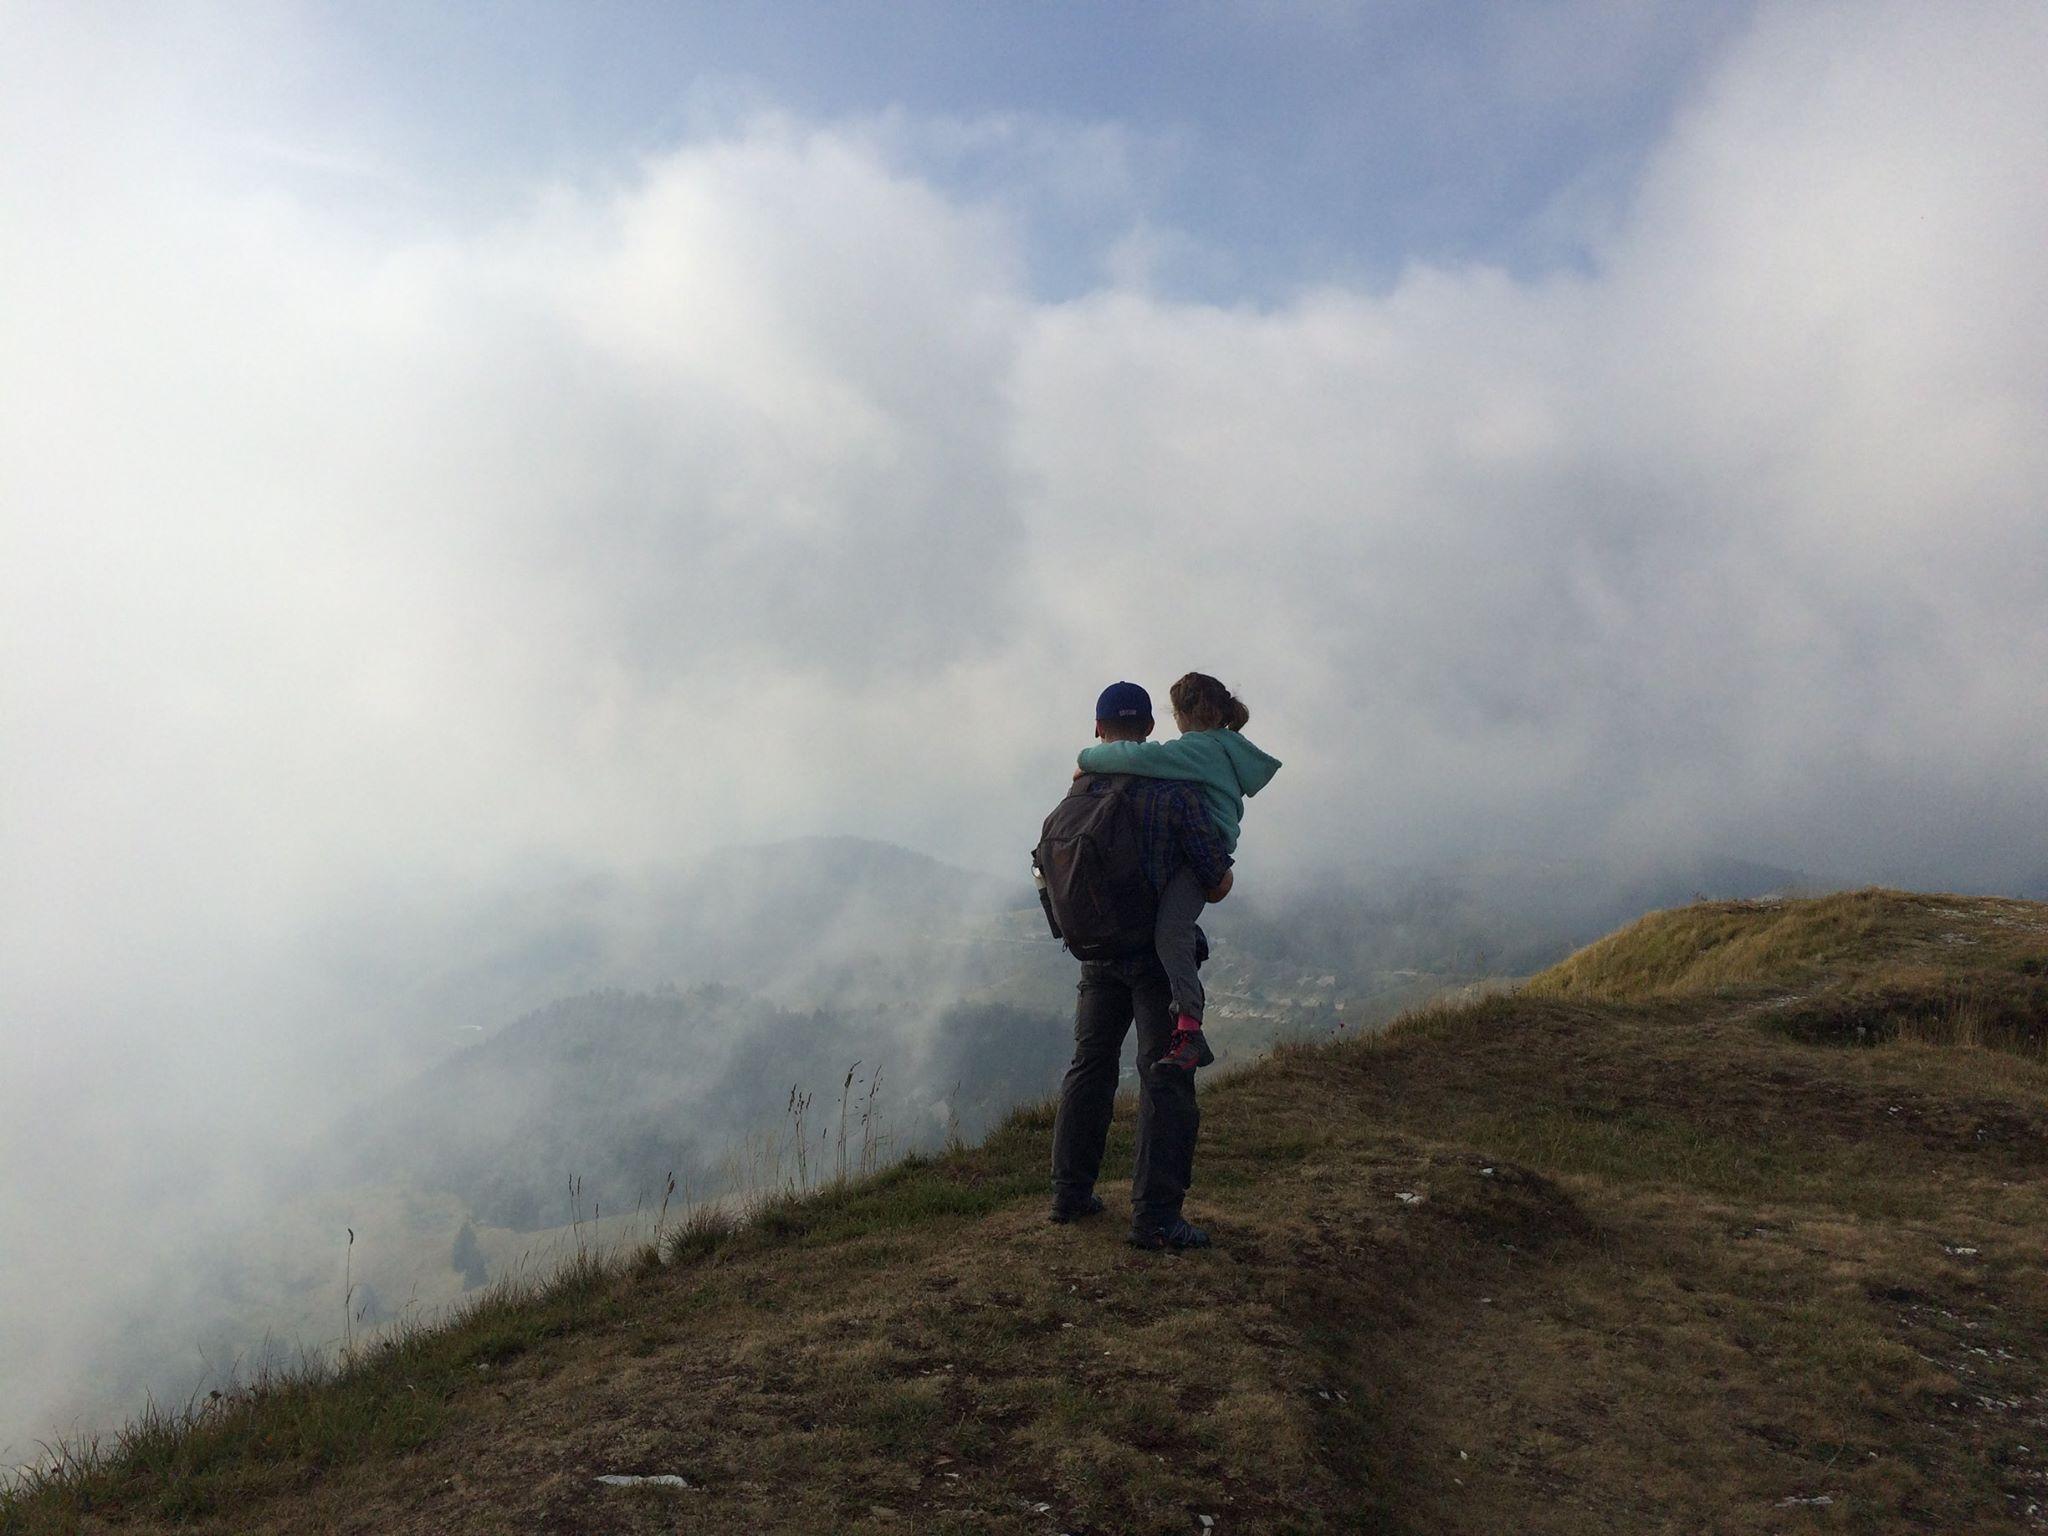 Monte Grappa hidden in fog